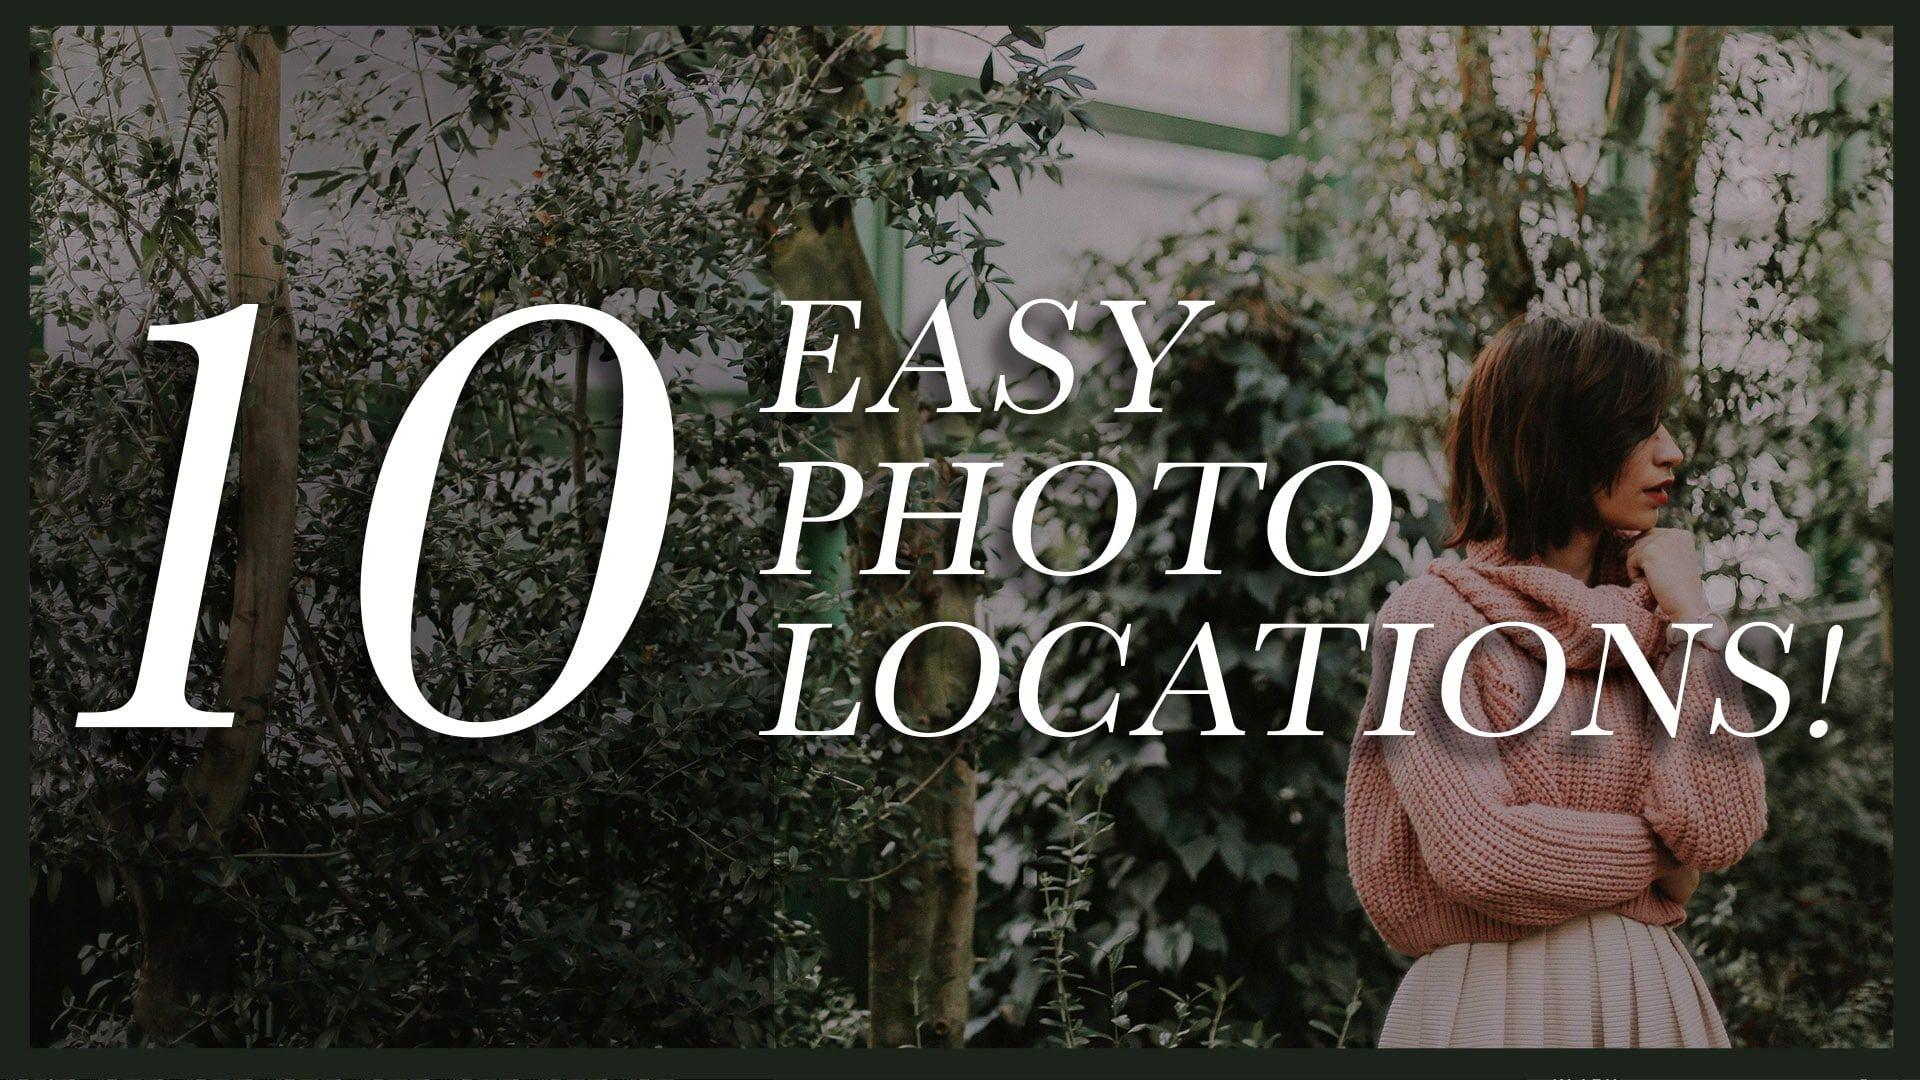 Photoshoot locations ideas